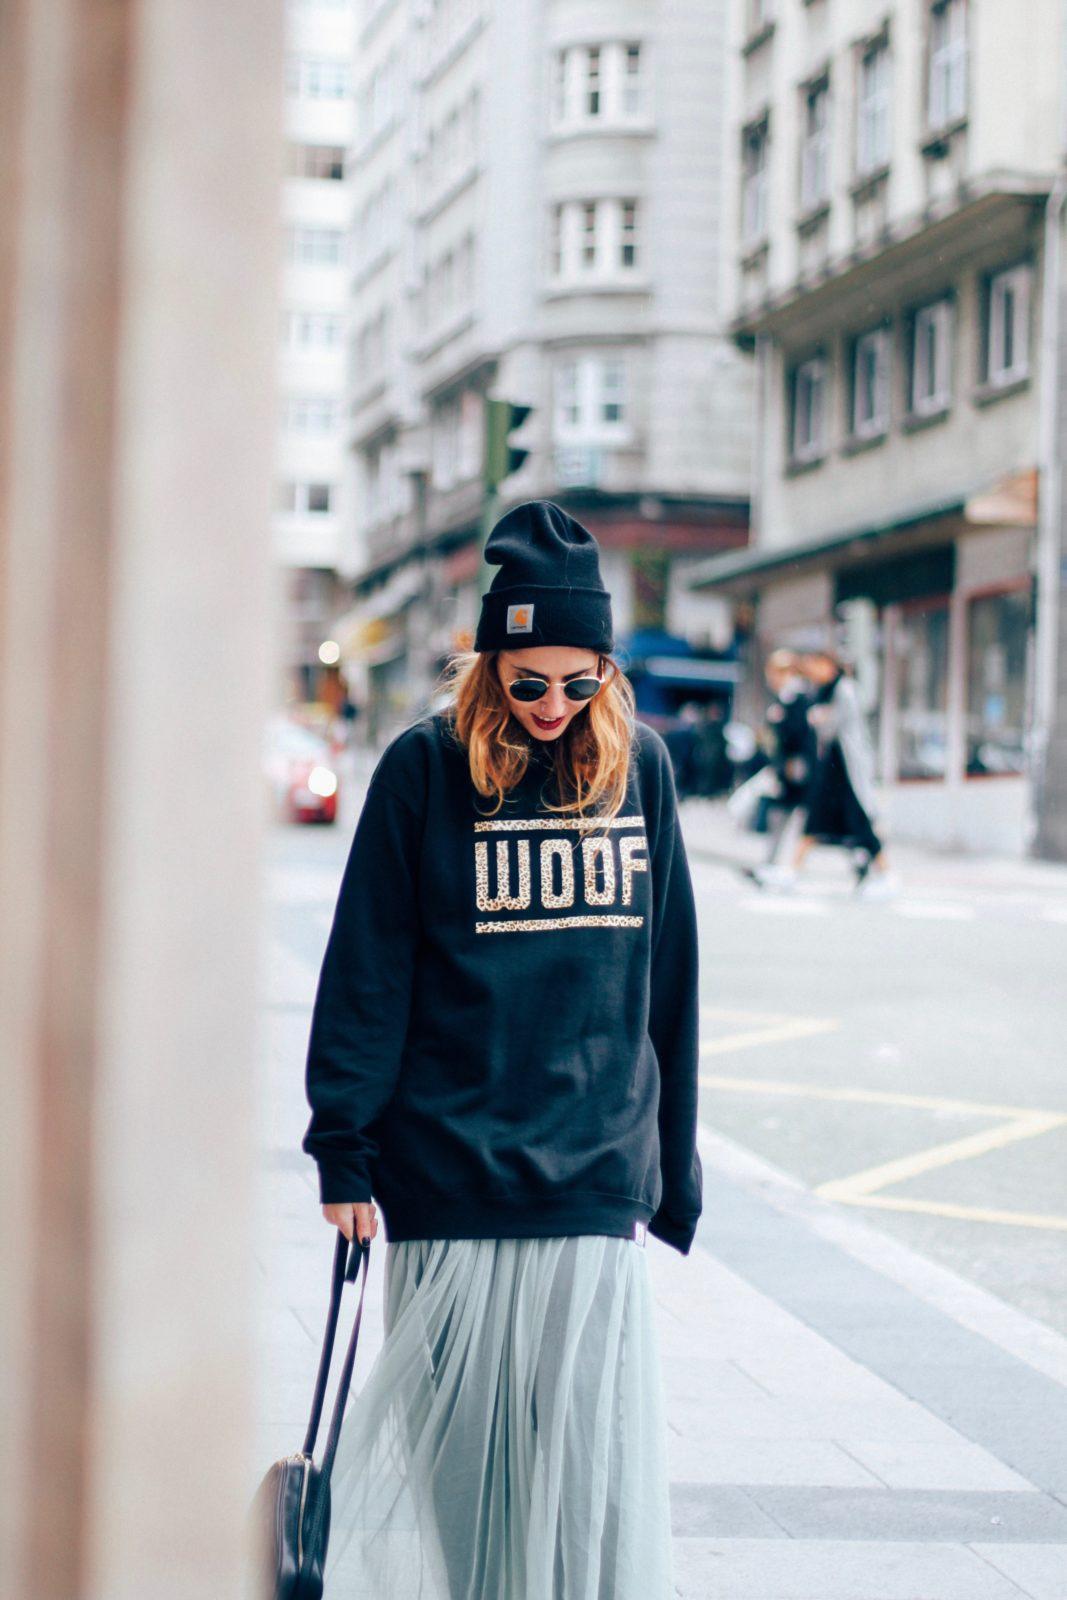 sudadera_old_dogs_falda_de_tul_vans_beanie_carhartt_look_donkeycool_street_style-27